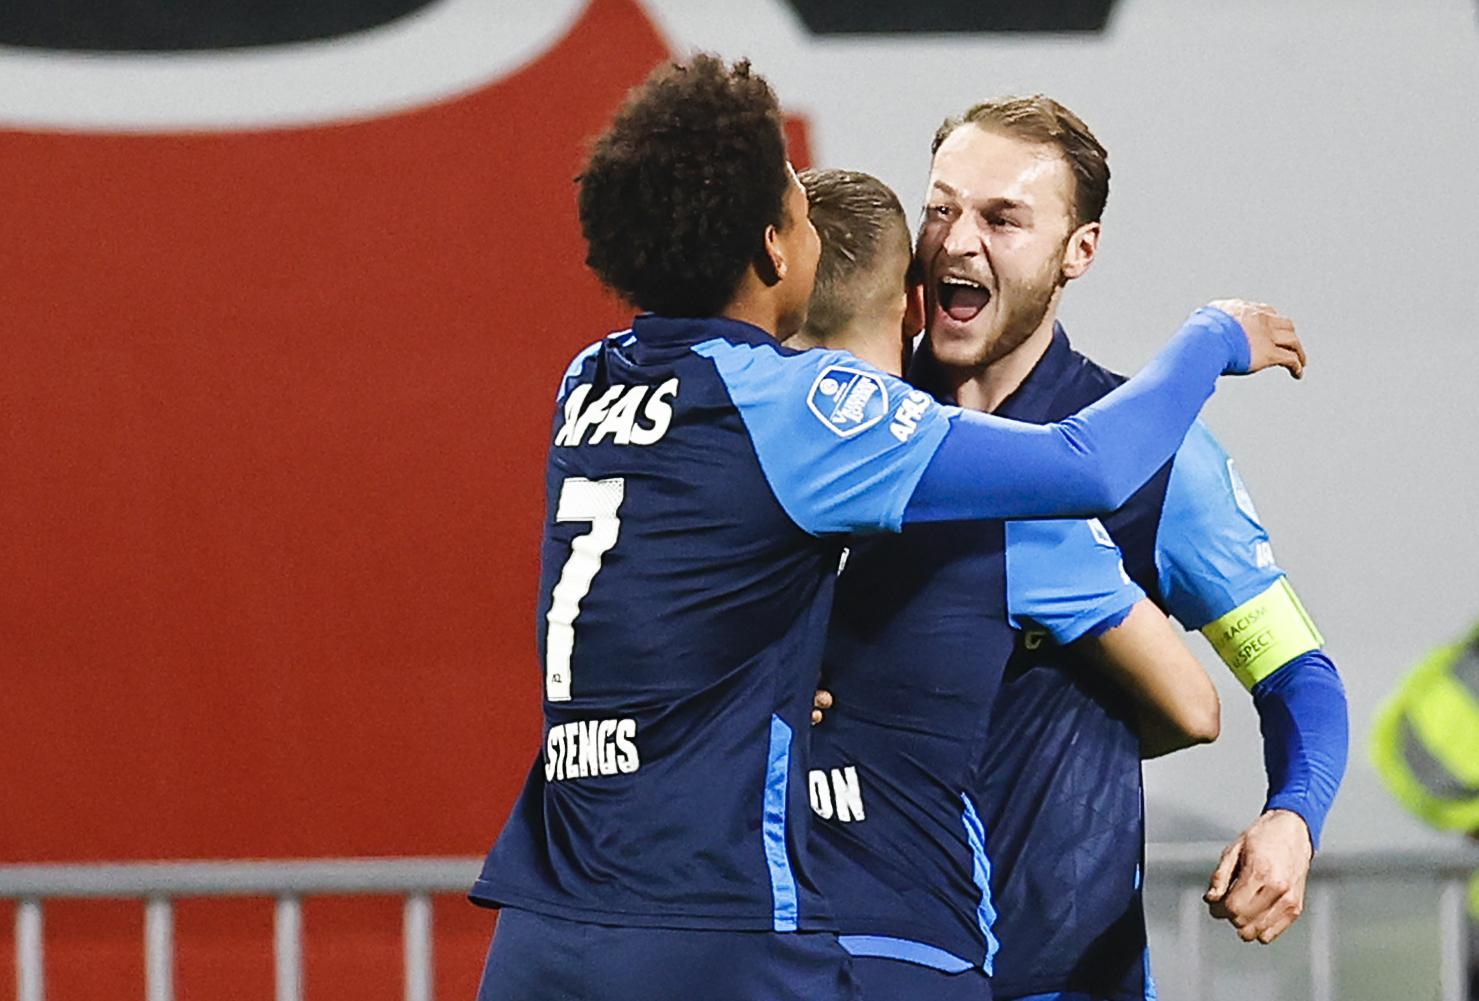 Daverende stunt van AZ in Eindhoven: PSV met 1-3 verslagen; Koopmeiners grote man met twee goals [video]